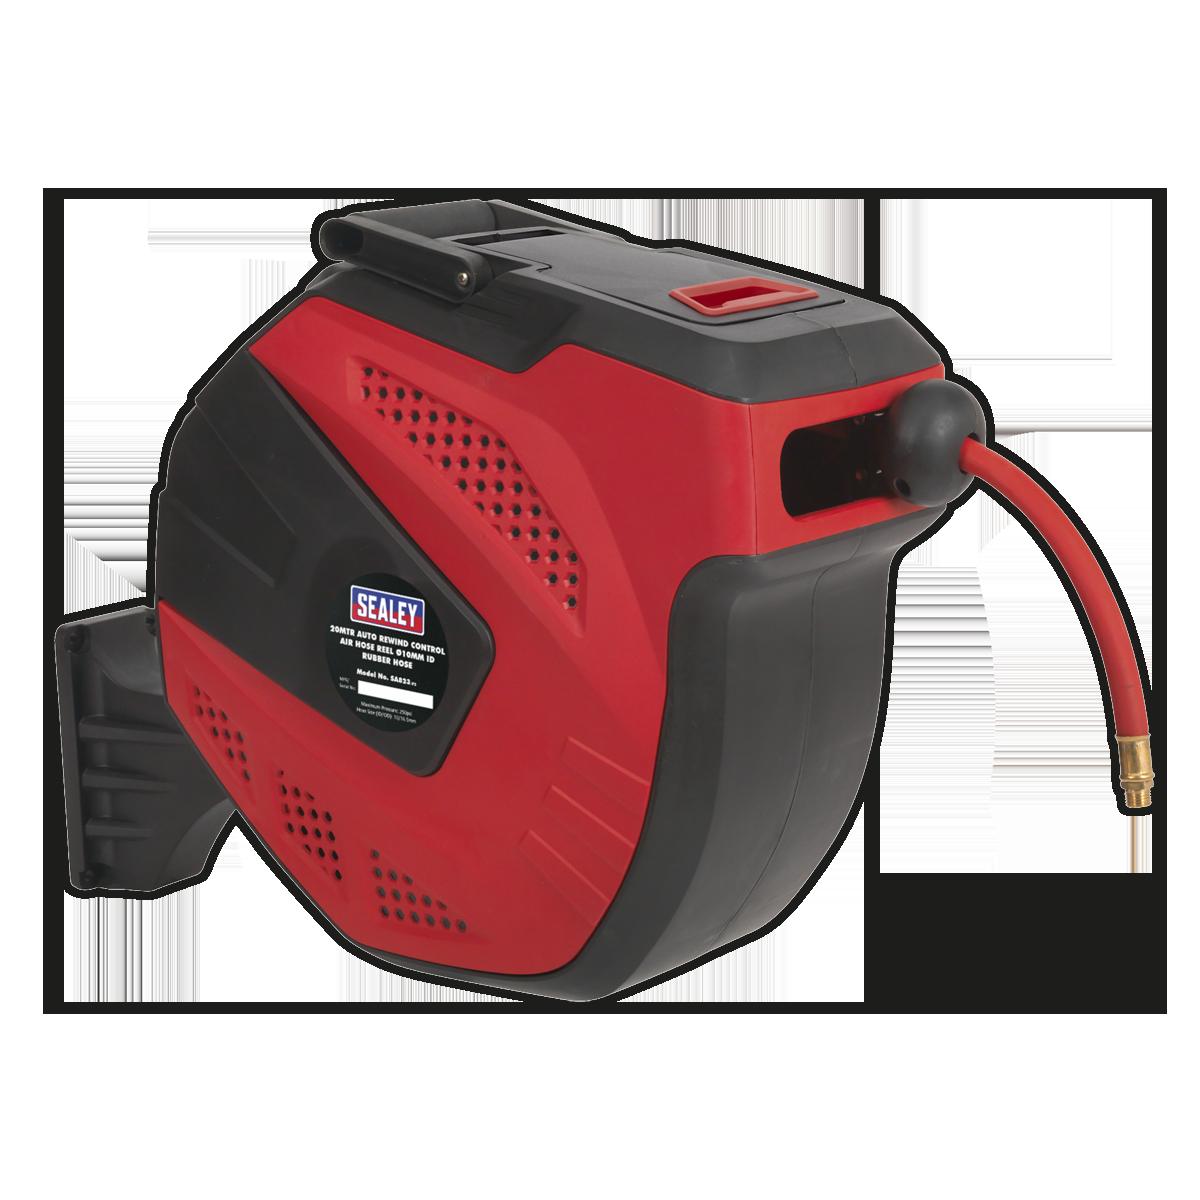 Air Hose Reel Auto-Rewind Control 20m Ø10mm ID - Rubber Hose